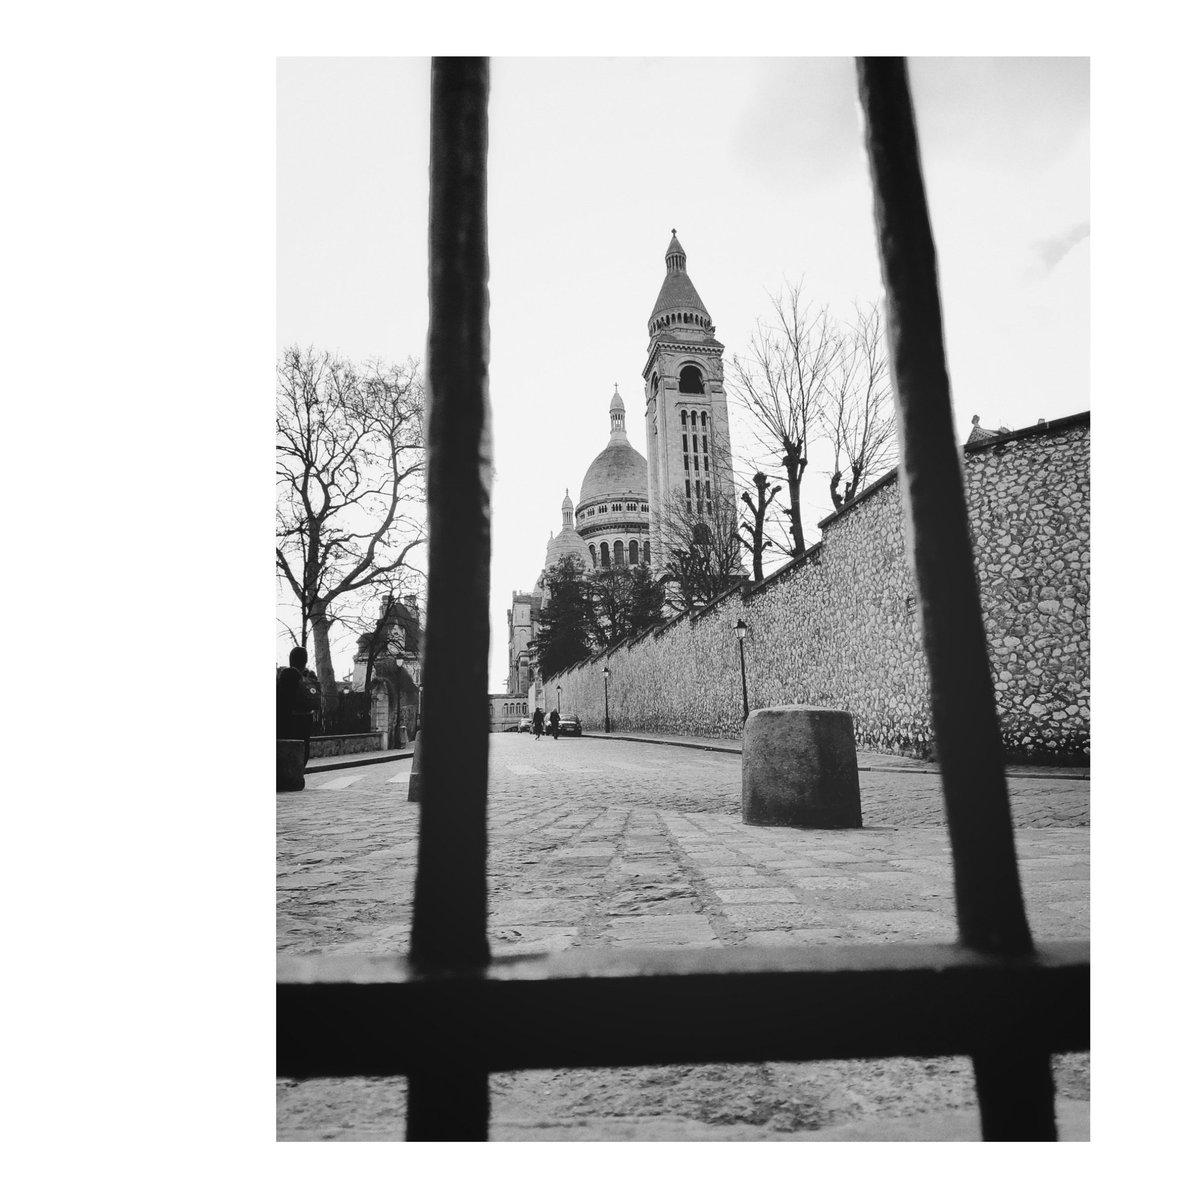 Sacré-Coeur (Paris, Février 2020)  #websta #picoftheday #photooftheday #igers #instalike #photogrid #snapseed #snapseedshot  #photography #photographie #pentax #pentaxk5 #paris #sacrecoeur #montmartre #france #nb #bw #bwphotography #bfxtg